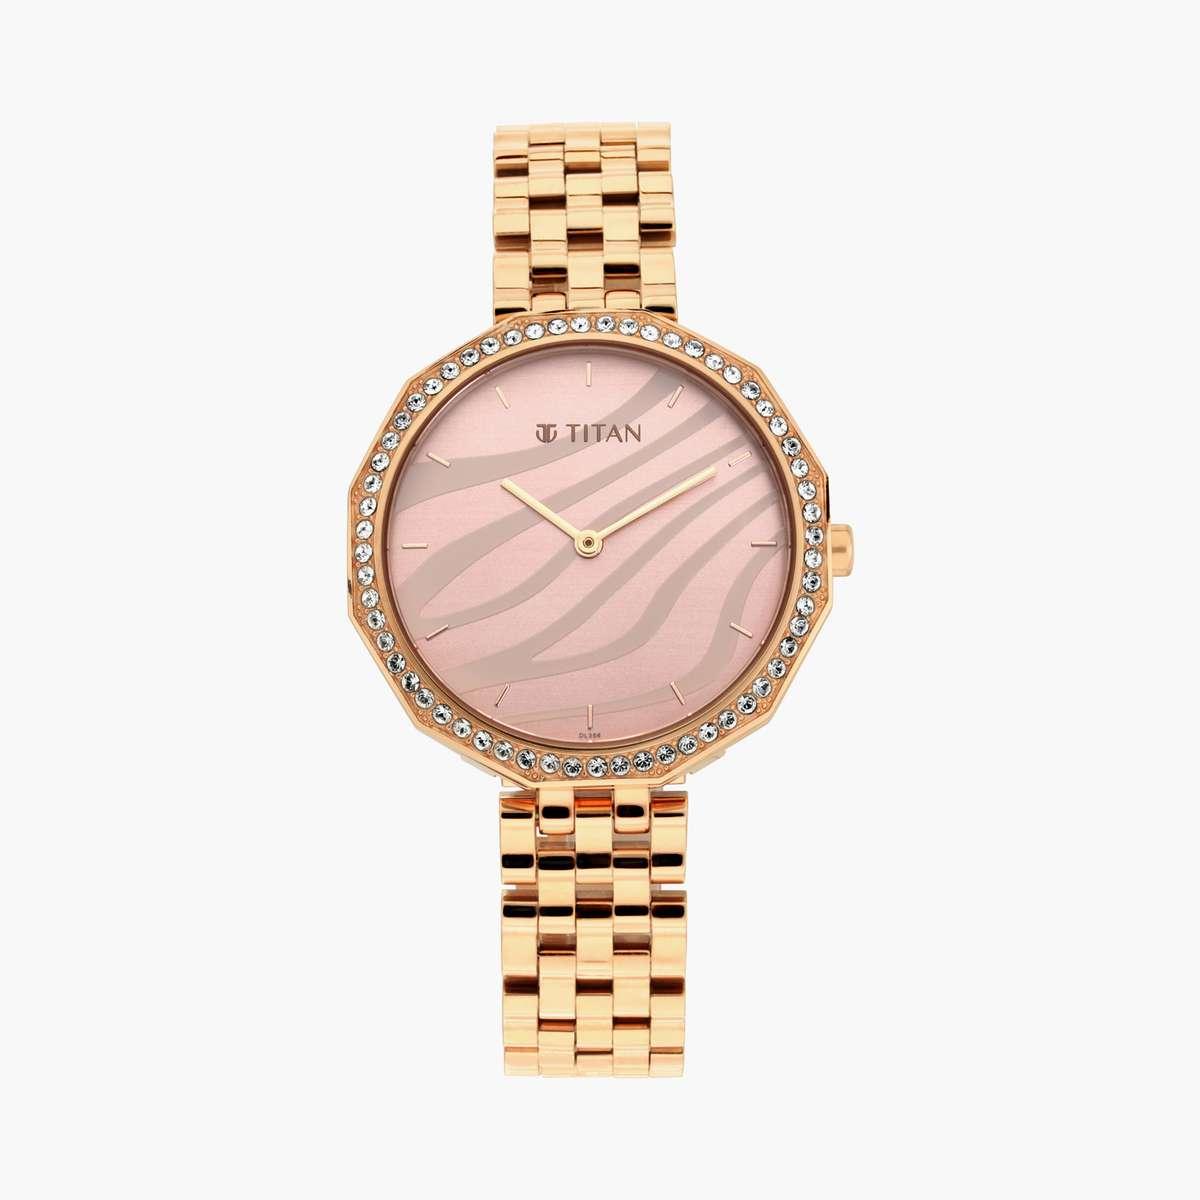 5.TITAN Women Embellished Analog Watch- 95132WM01